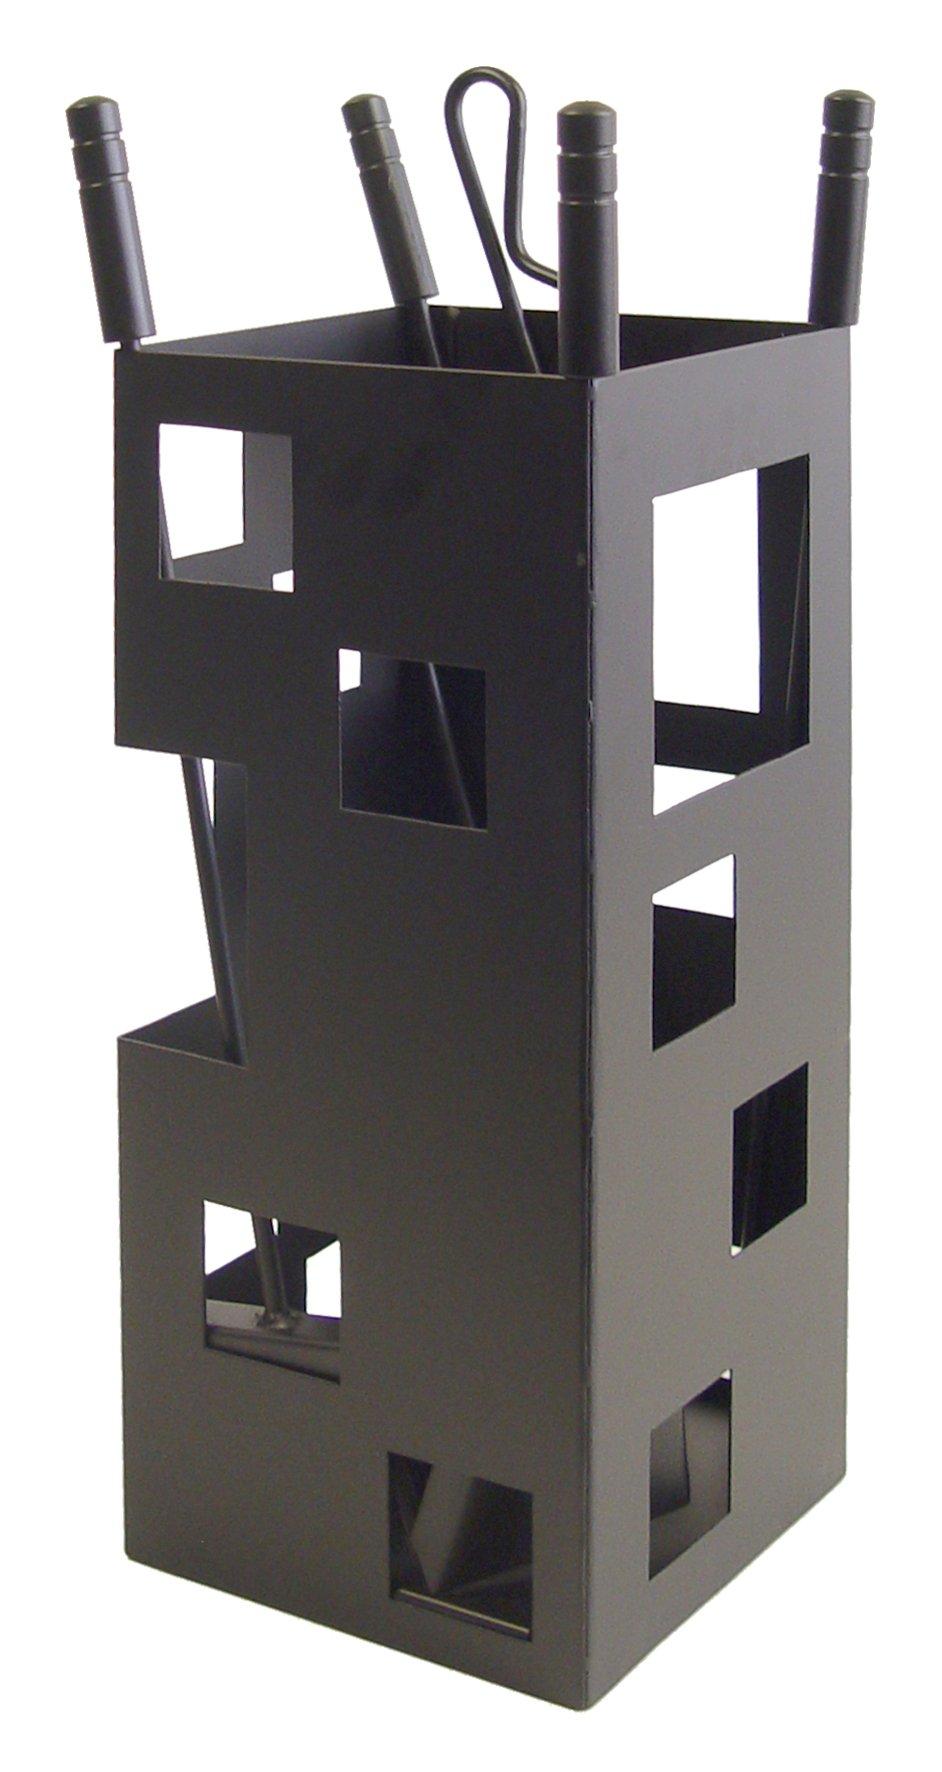 Imex El Zorro 10004 Juego para chimenea, cuadrado (50 x 20 x 20 cm